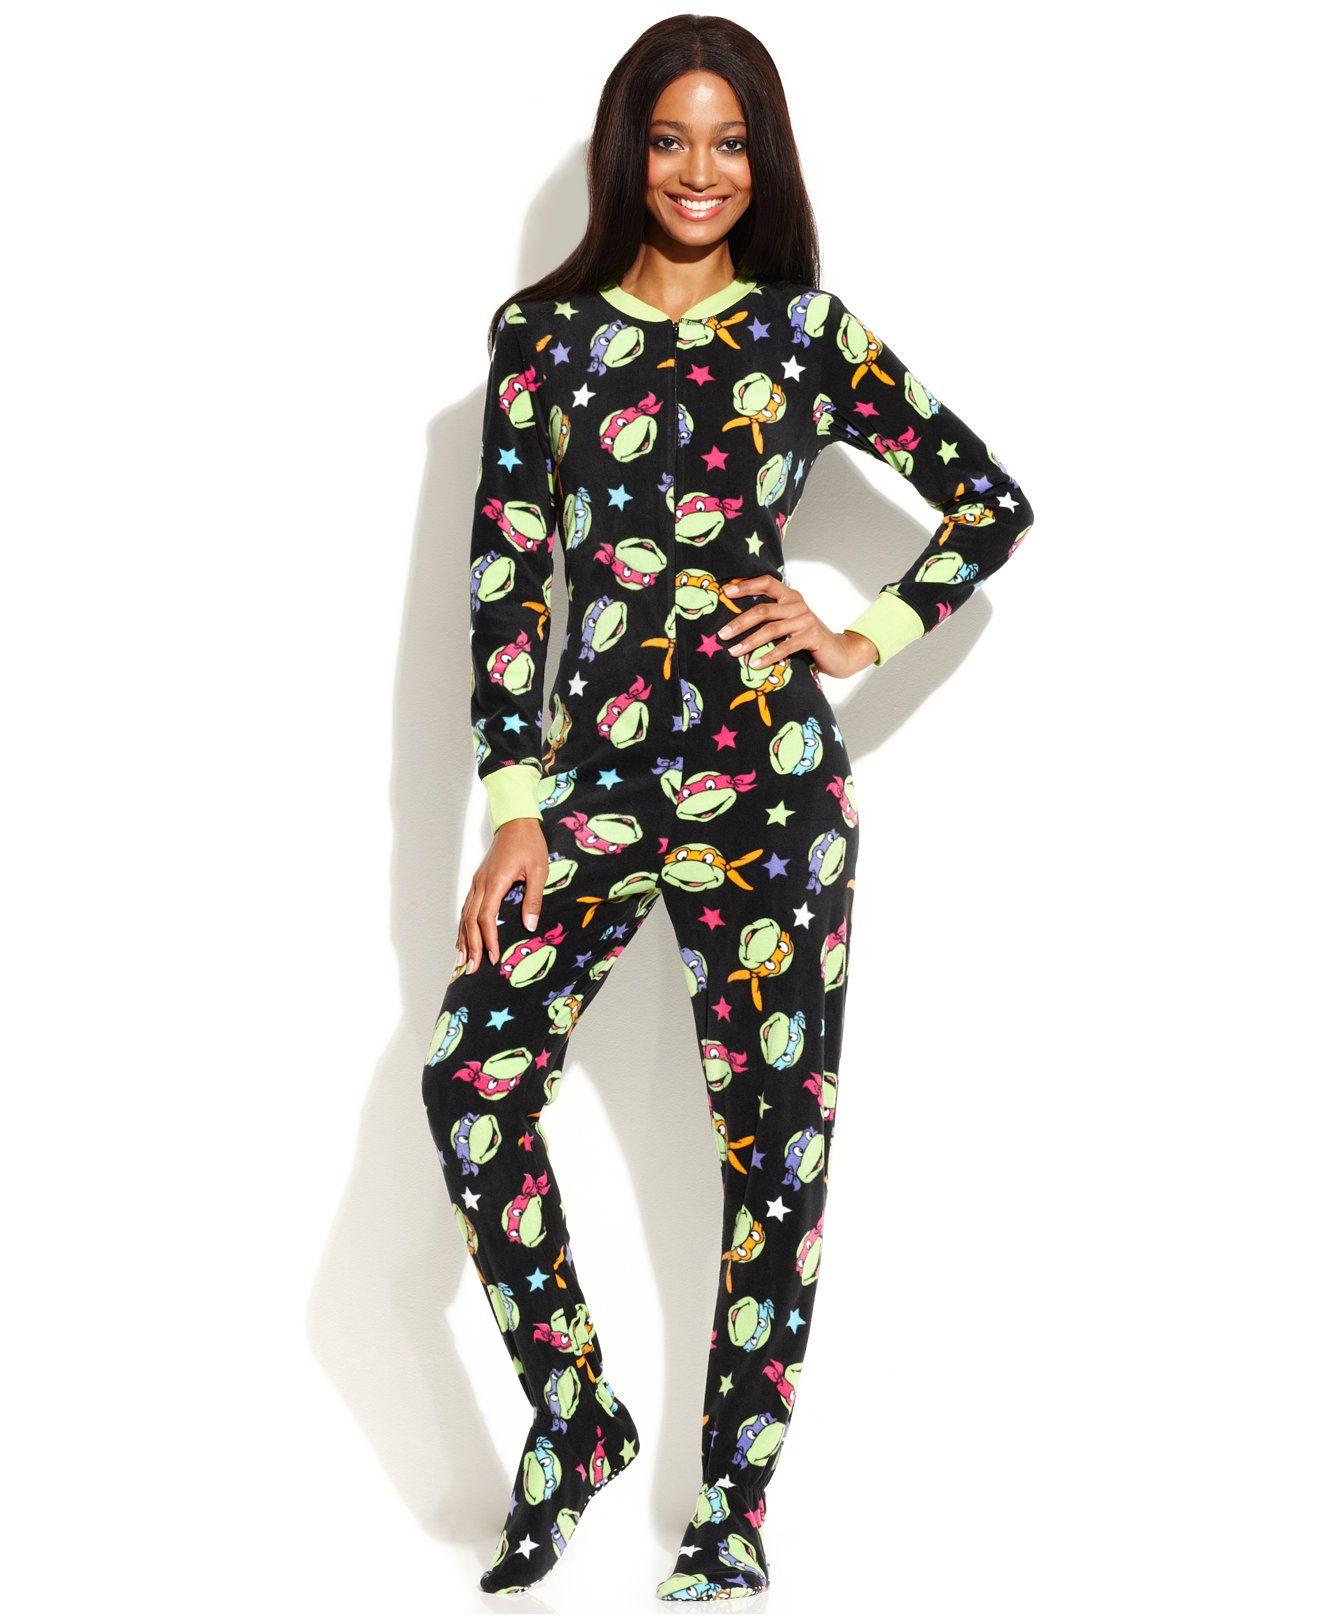 86dc54969 Briefly Stated Teenage Mutant Ninja Turtles Footed Pajamas - Shop ...